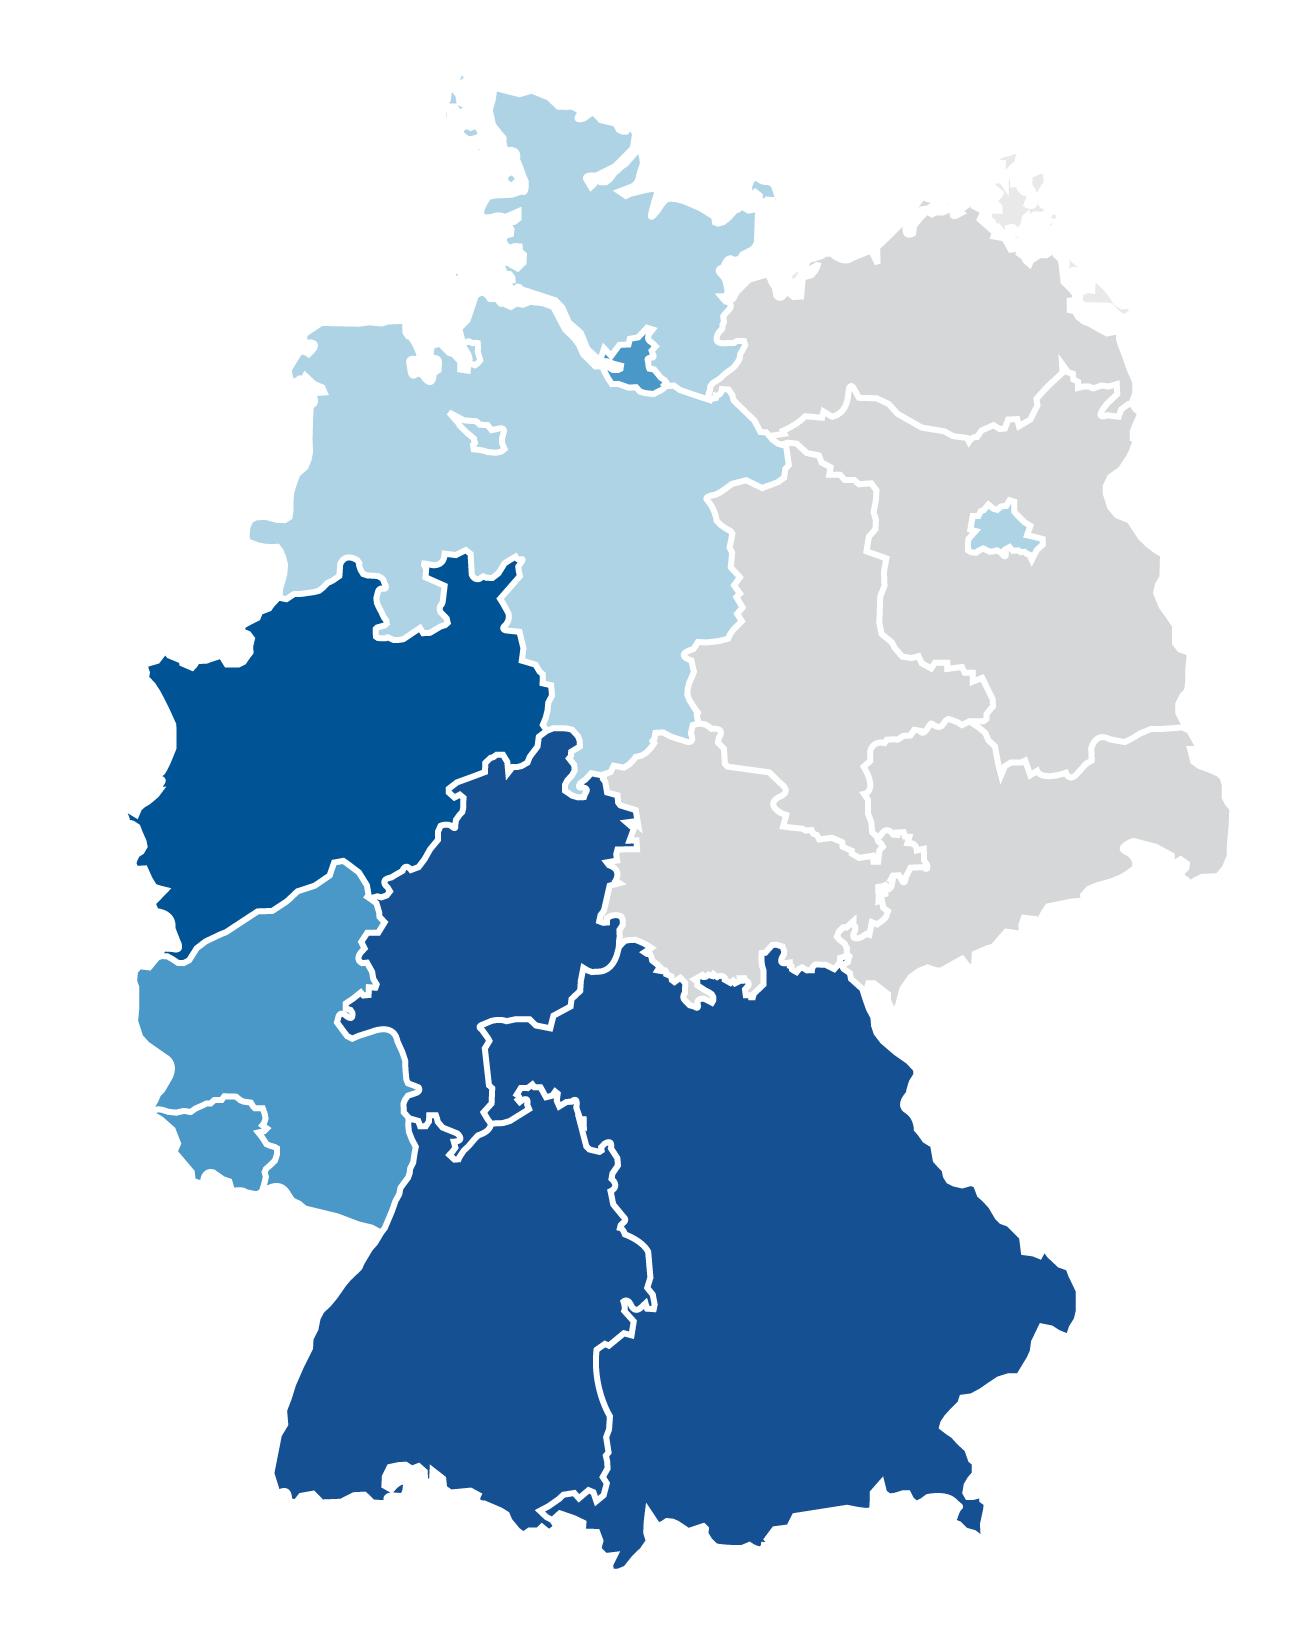 StepStone_Gehaltsreport_2016_Deutschlandkarte